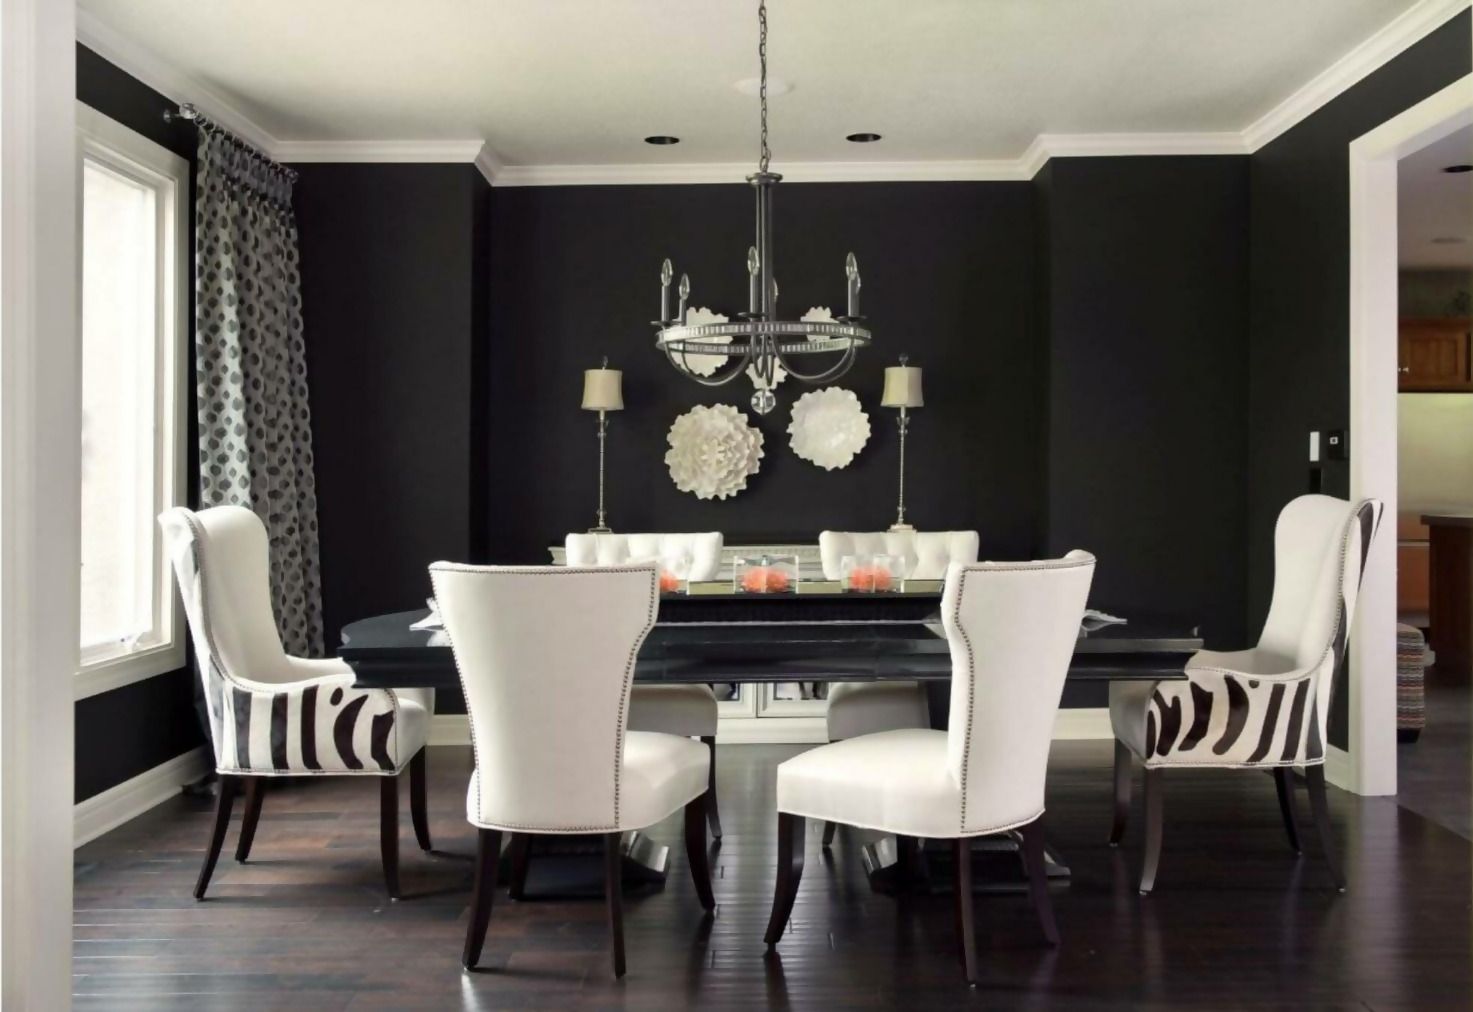 Awesome Dining Room Decor Ideas Interior Design Explained